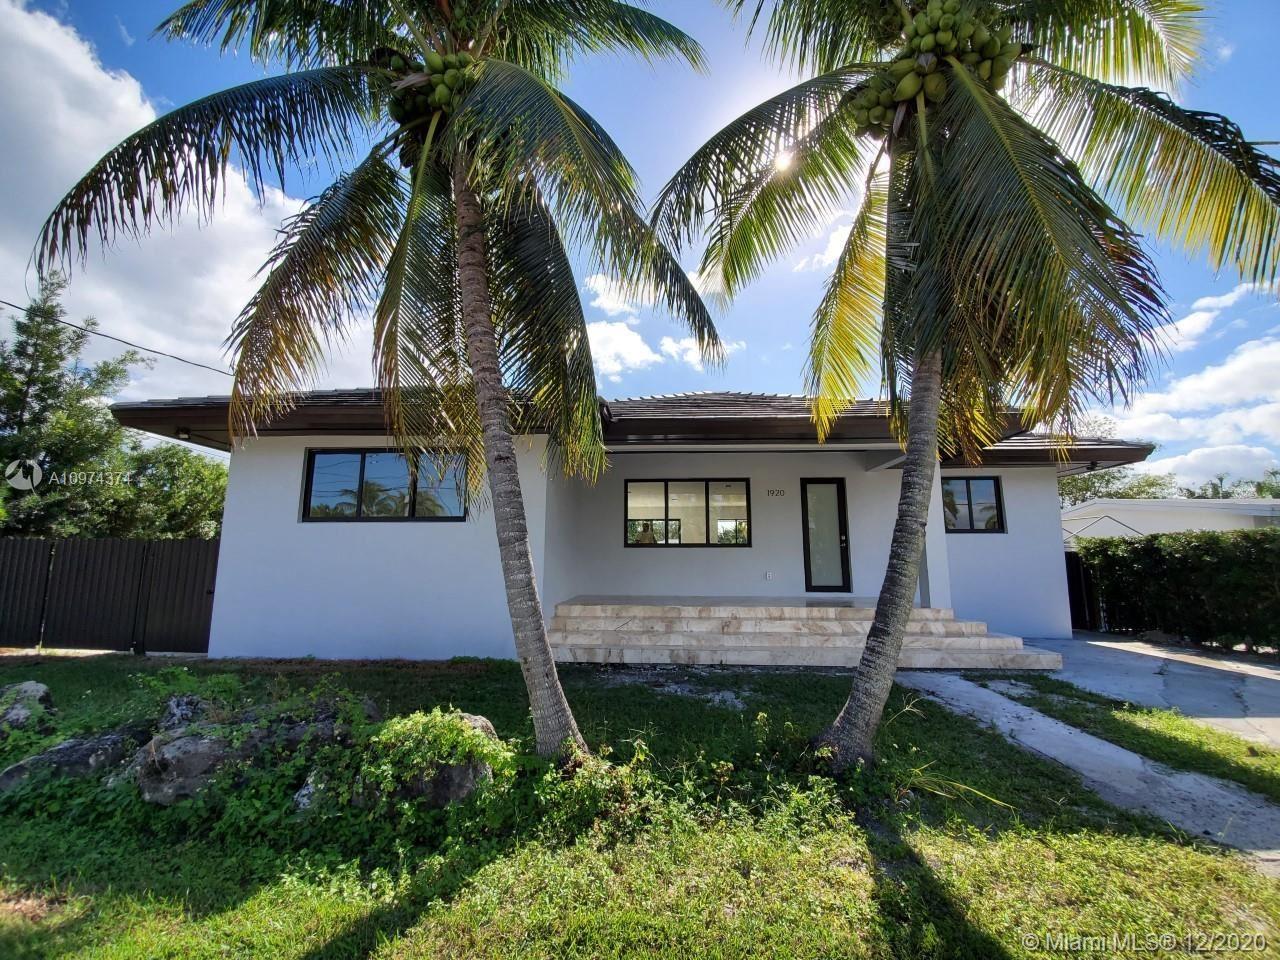 1920 N Hibiscus Dr, North Miami, FL 33181 - #: A10974374